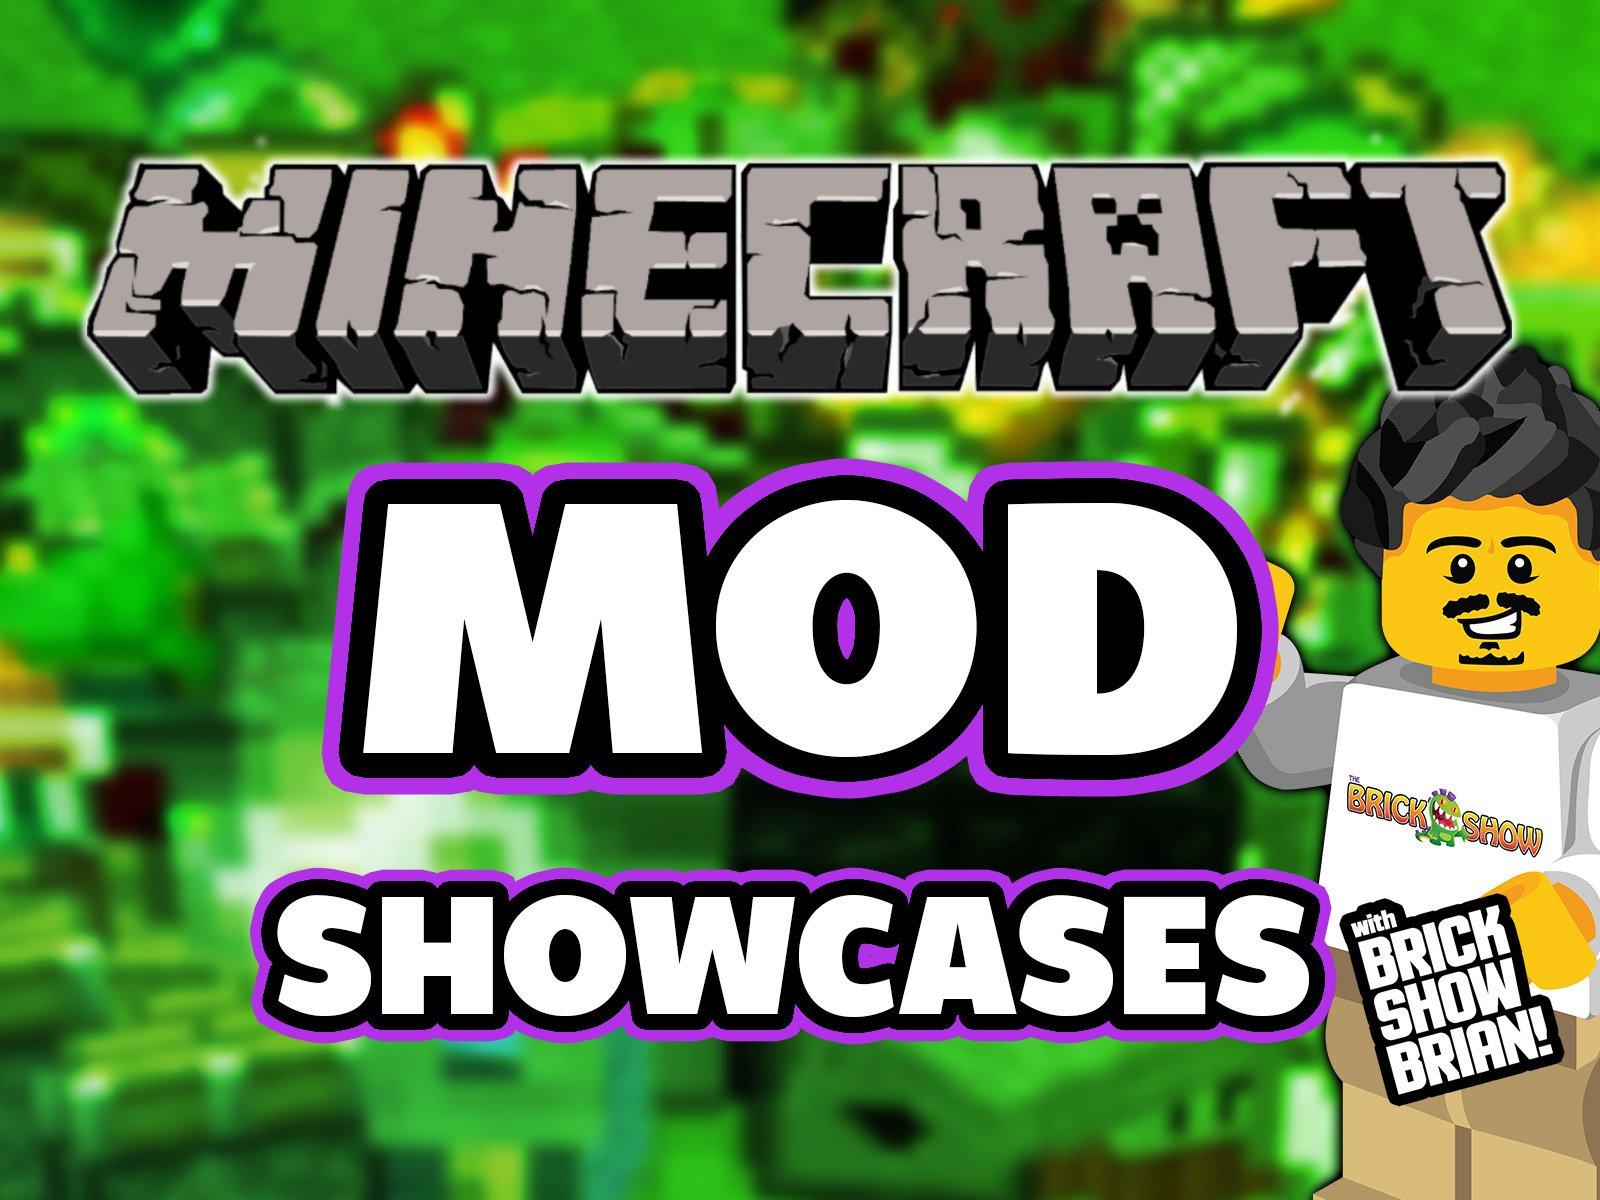 Clip: Minecraft Mod Showcase with Brick Show Brian - Season 1